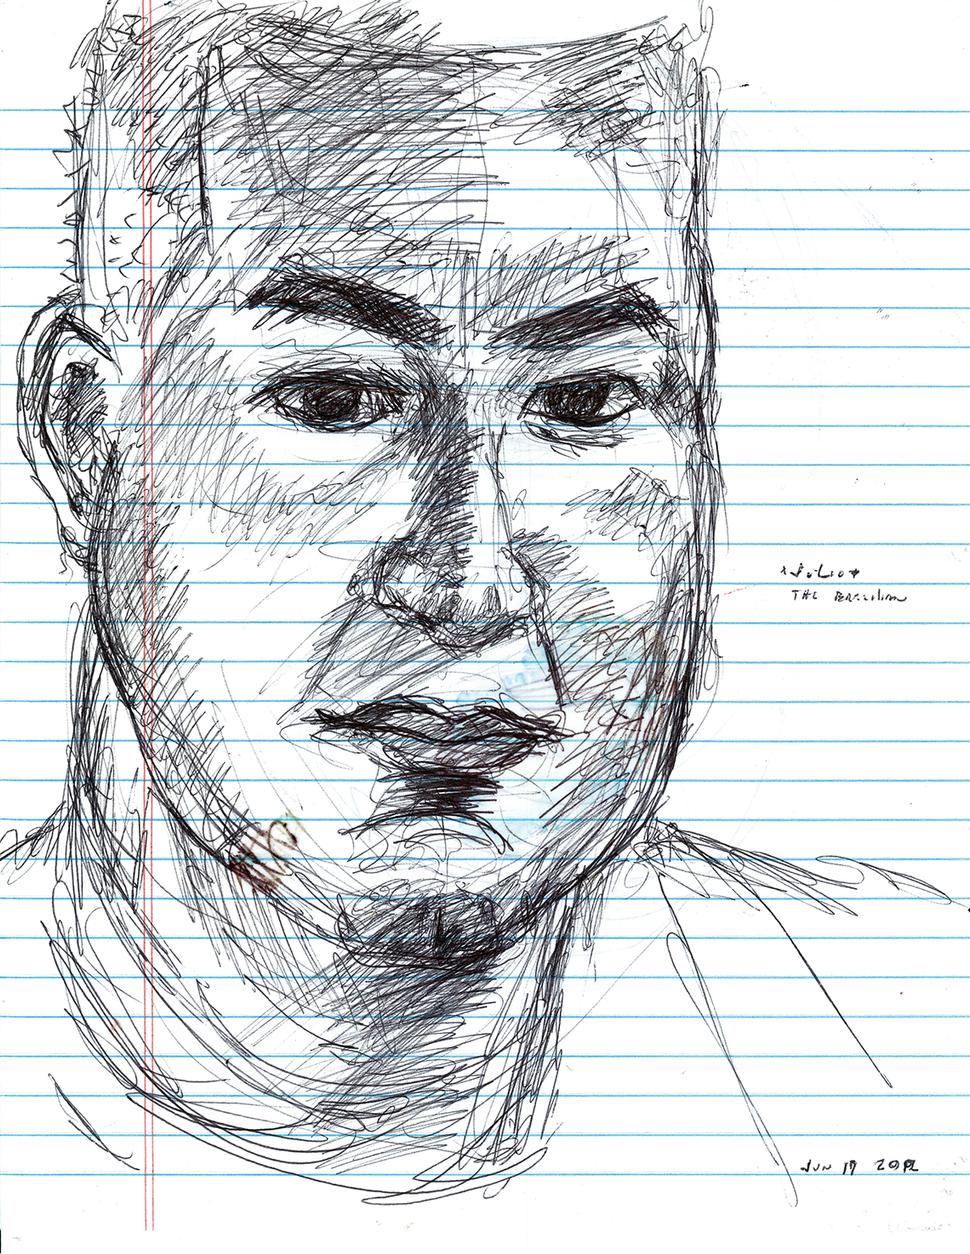 JoséAlvarez (D.O.P.A.) Julio, Brazil, 2012, Ballpoint pen on paper